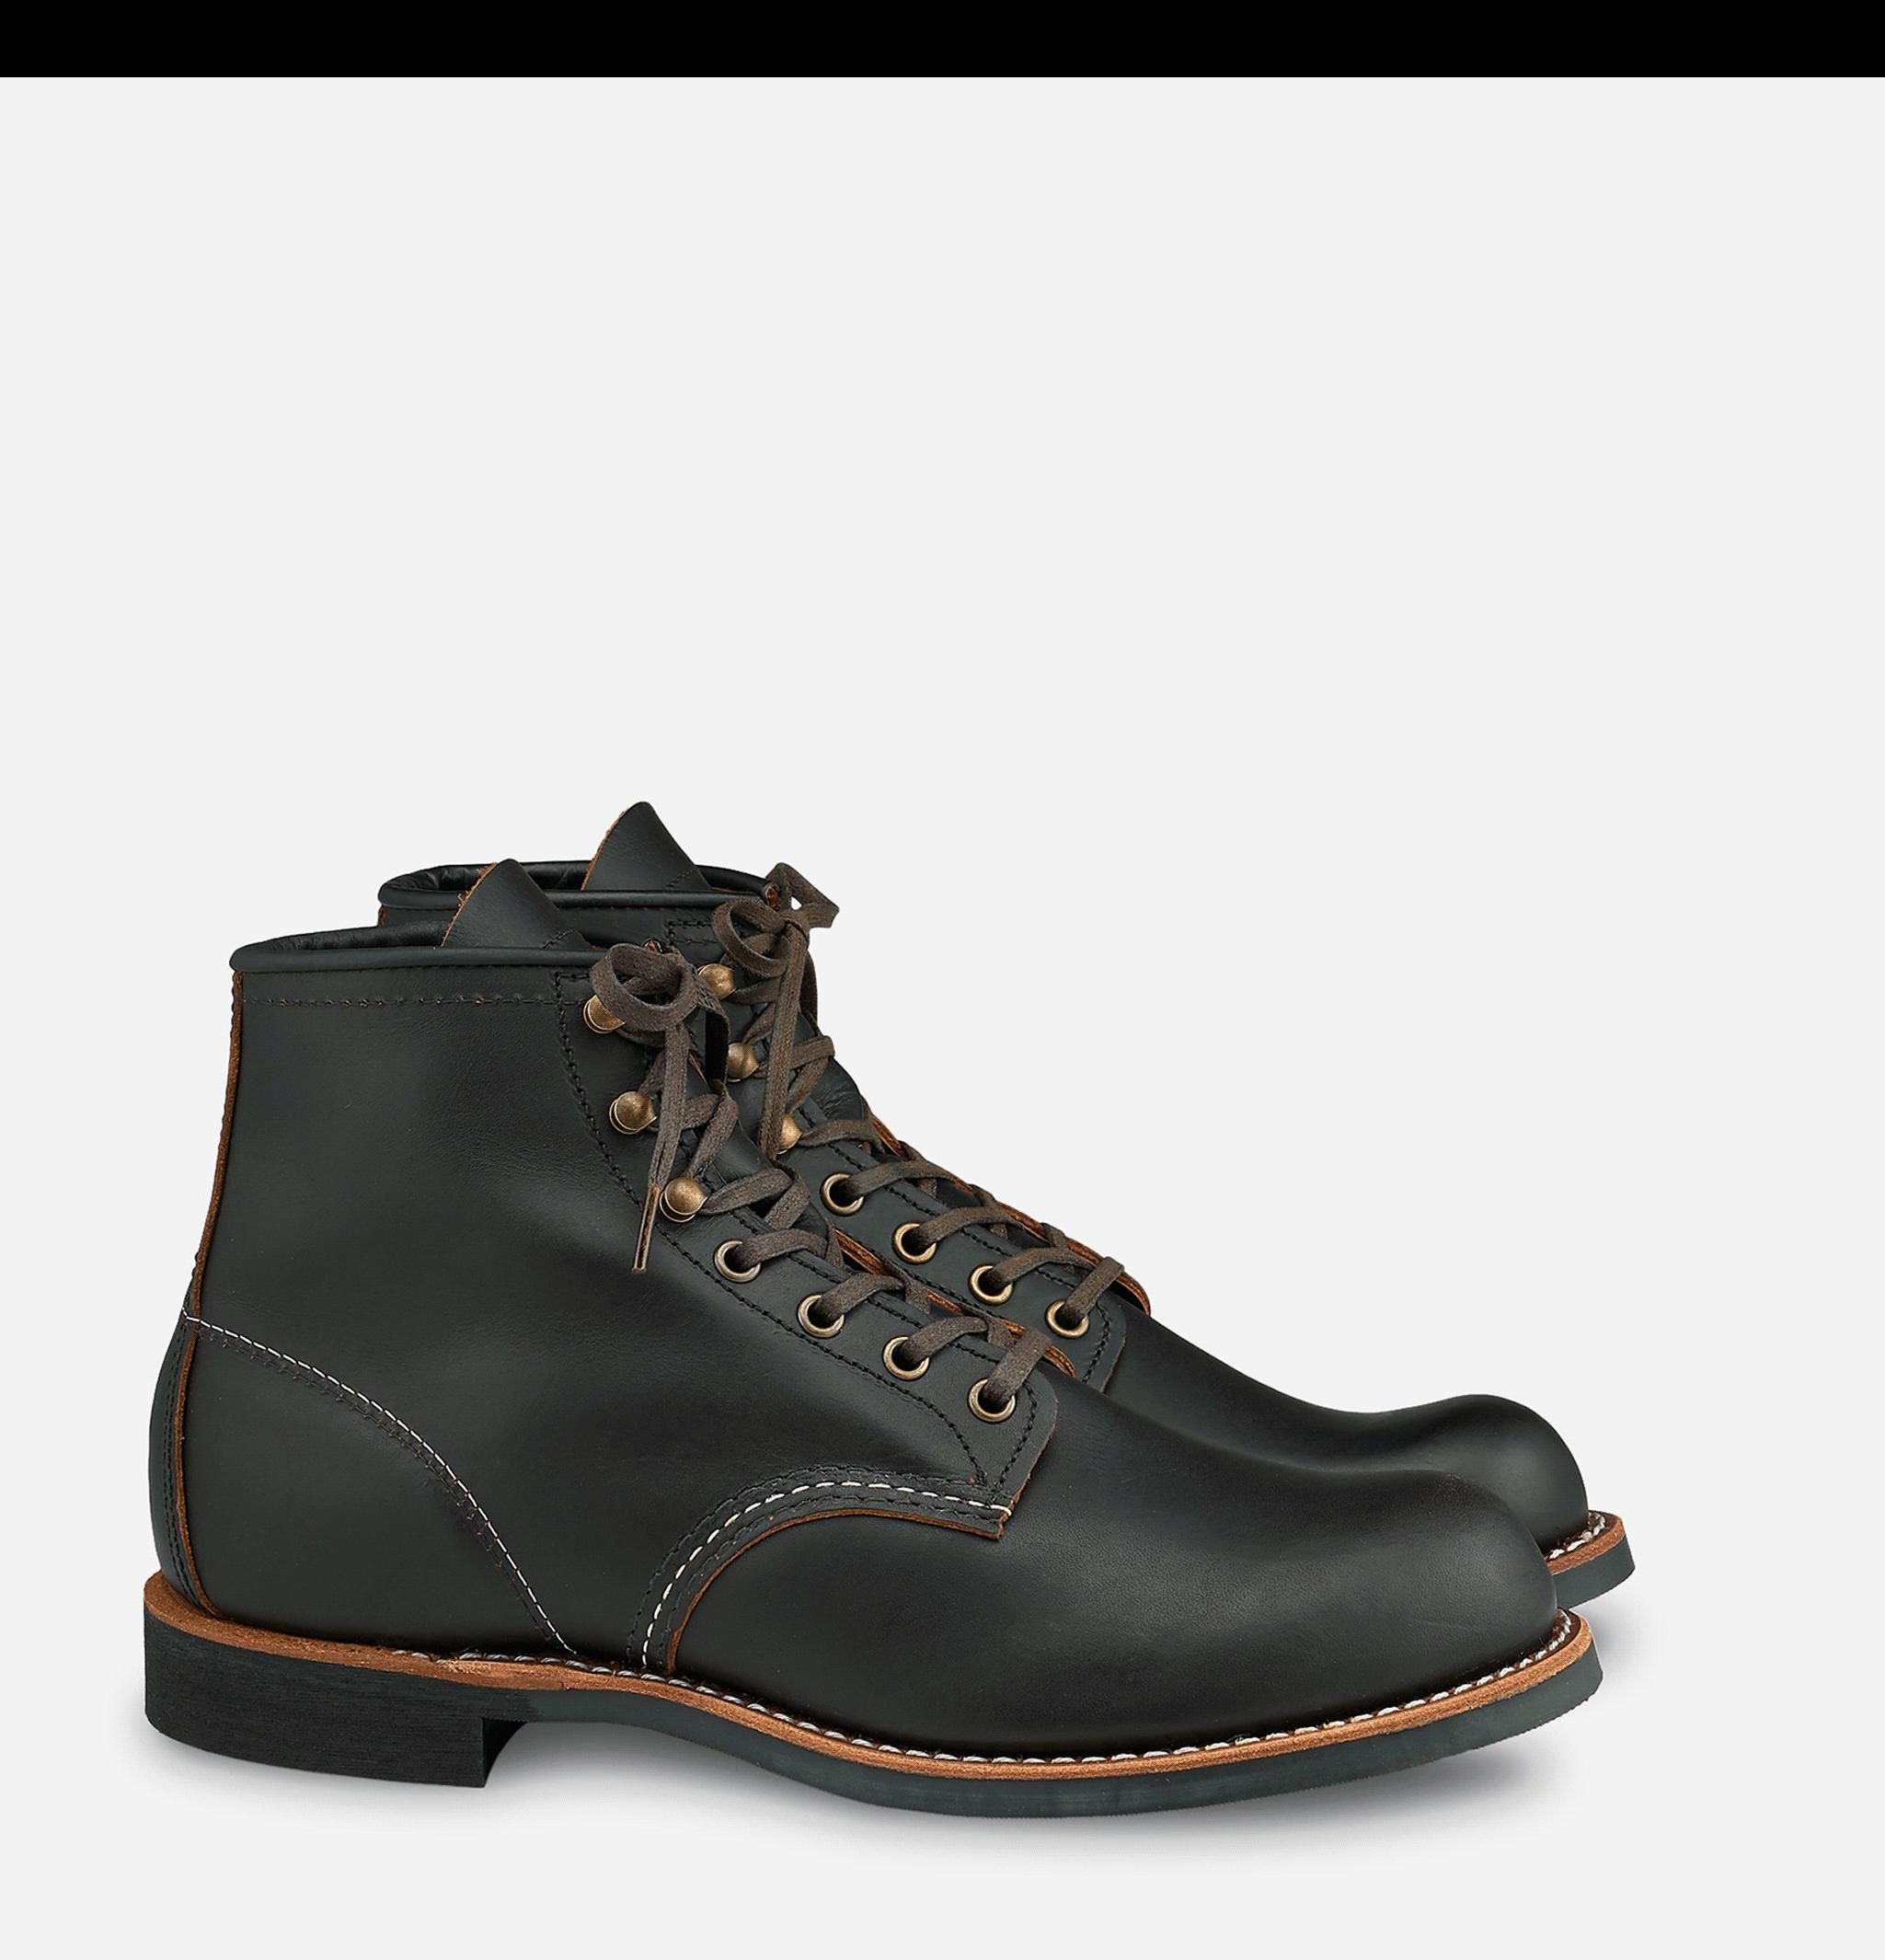 3345 - Blacksmith Black